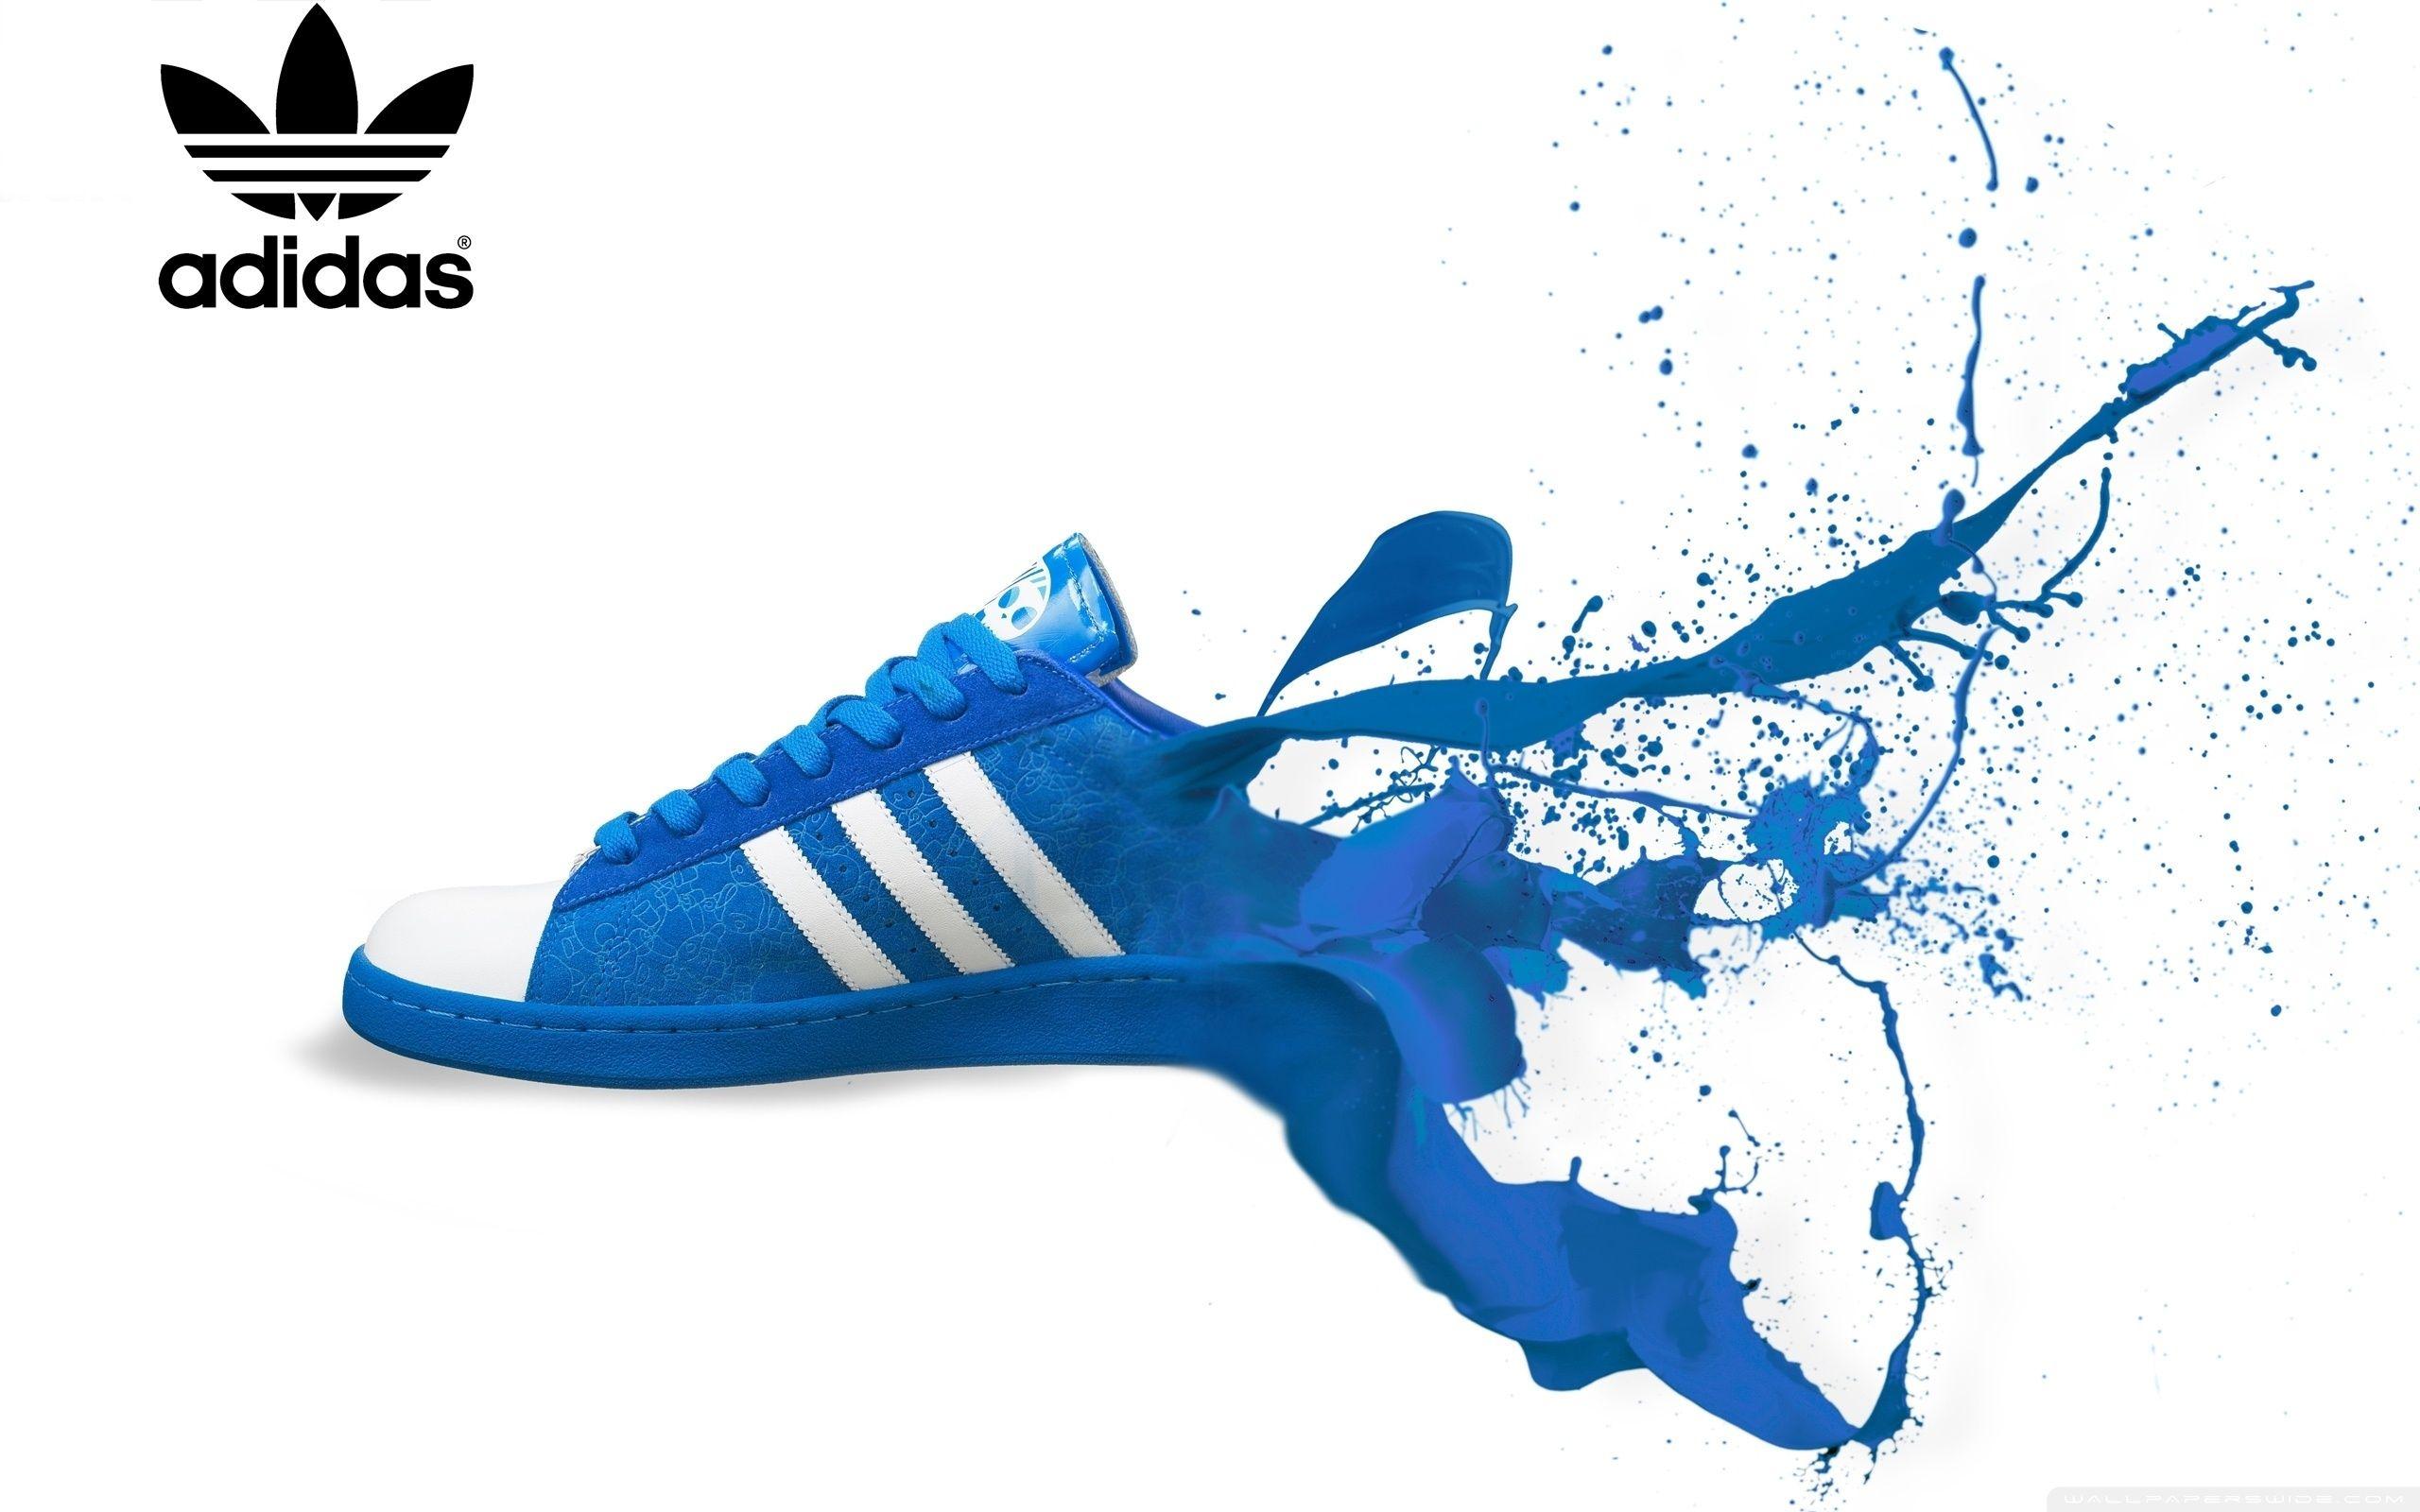 adidas shoes 90's design elements vector art backgrounds 597